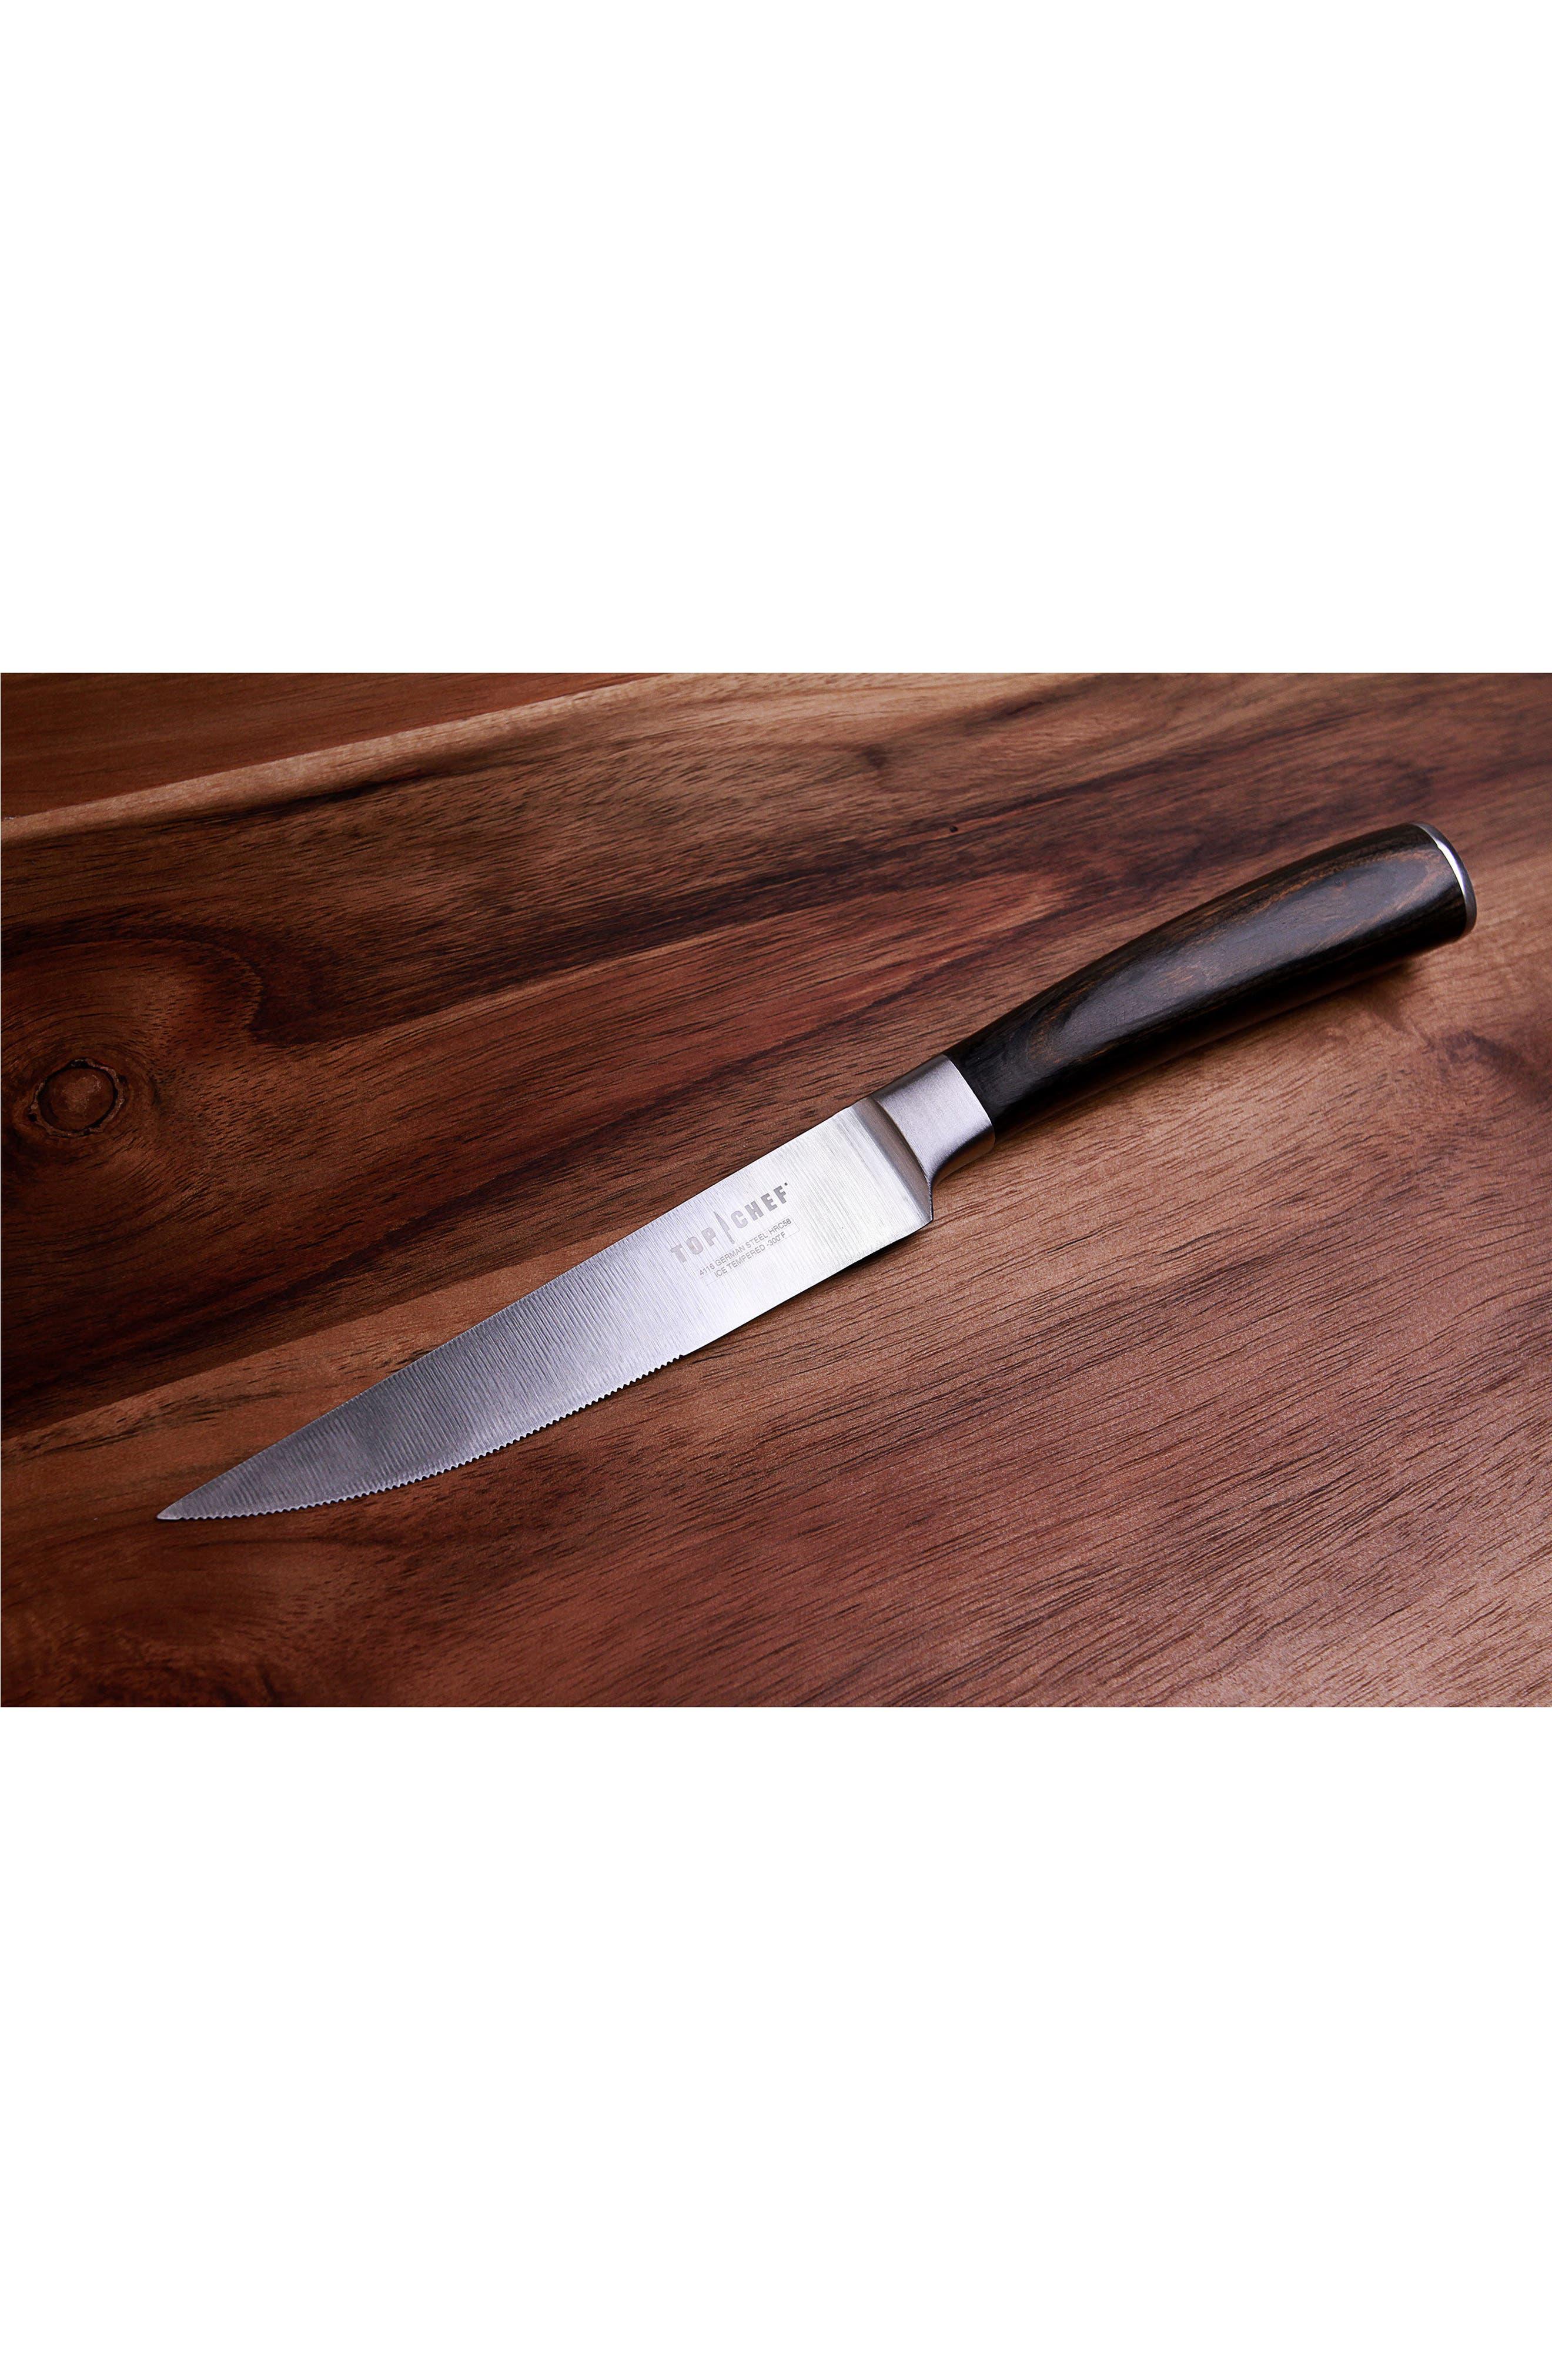 Dynasty 4-Piece Steak Knife Set,                             Alternate thumbnail 2, color,                             DYNASTY